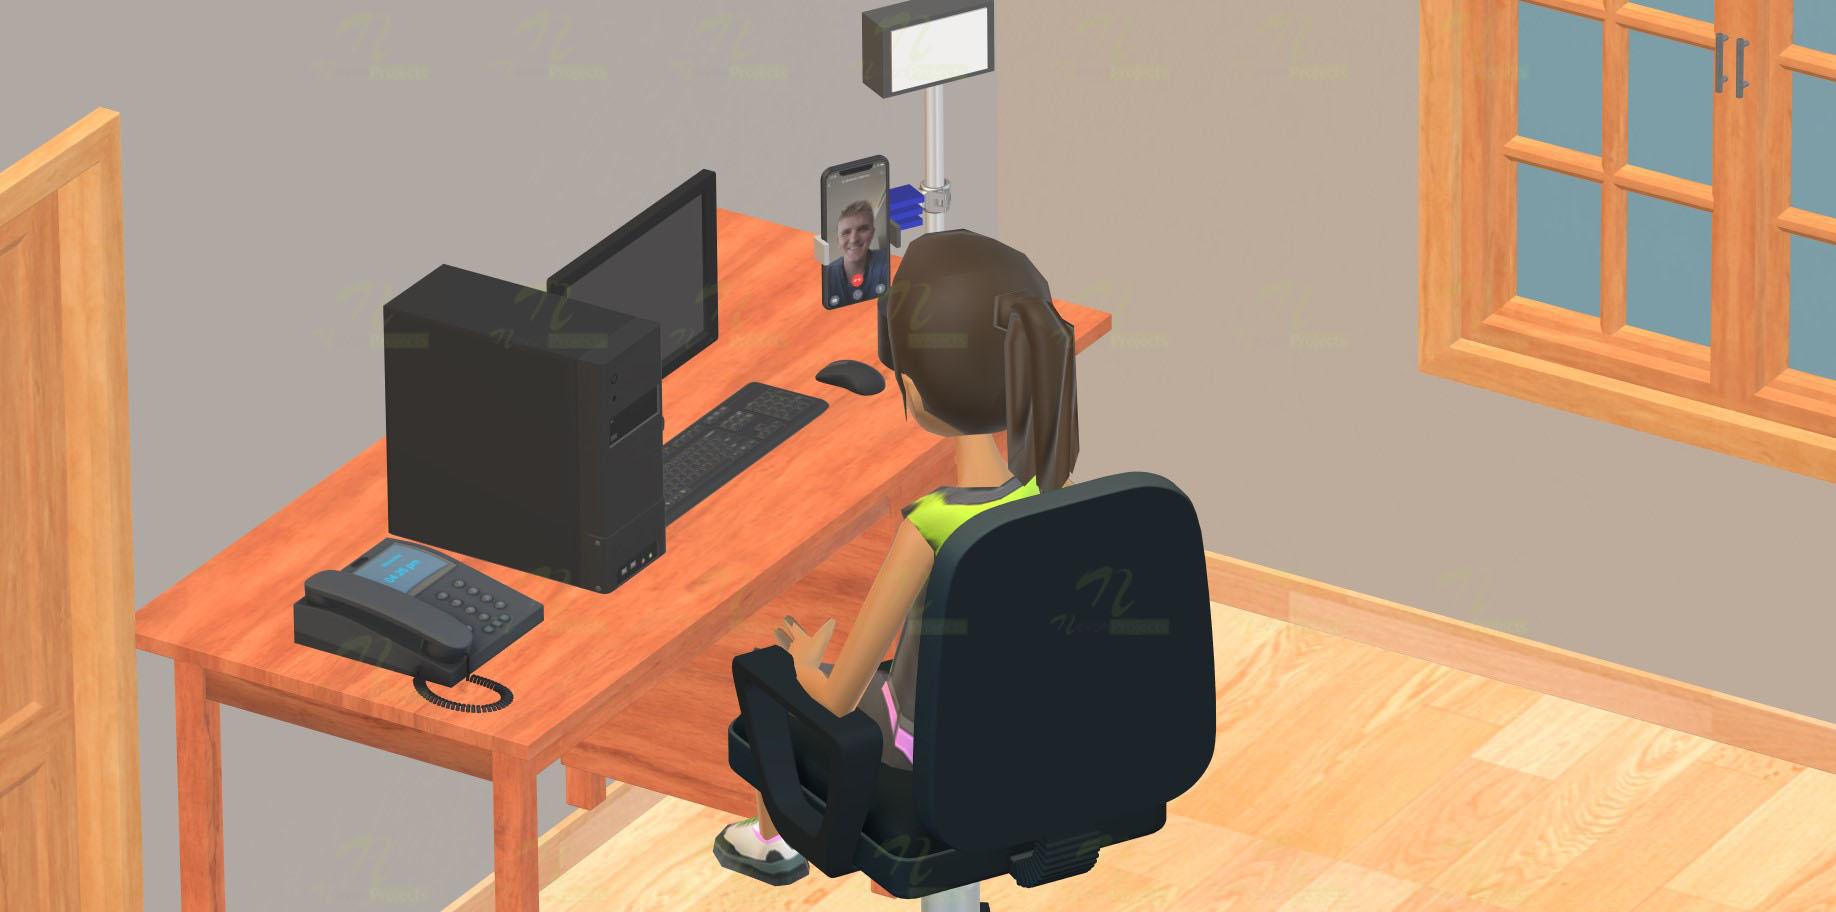 Nevon Video Calling/Recording Smartphone Stand